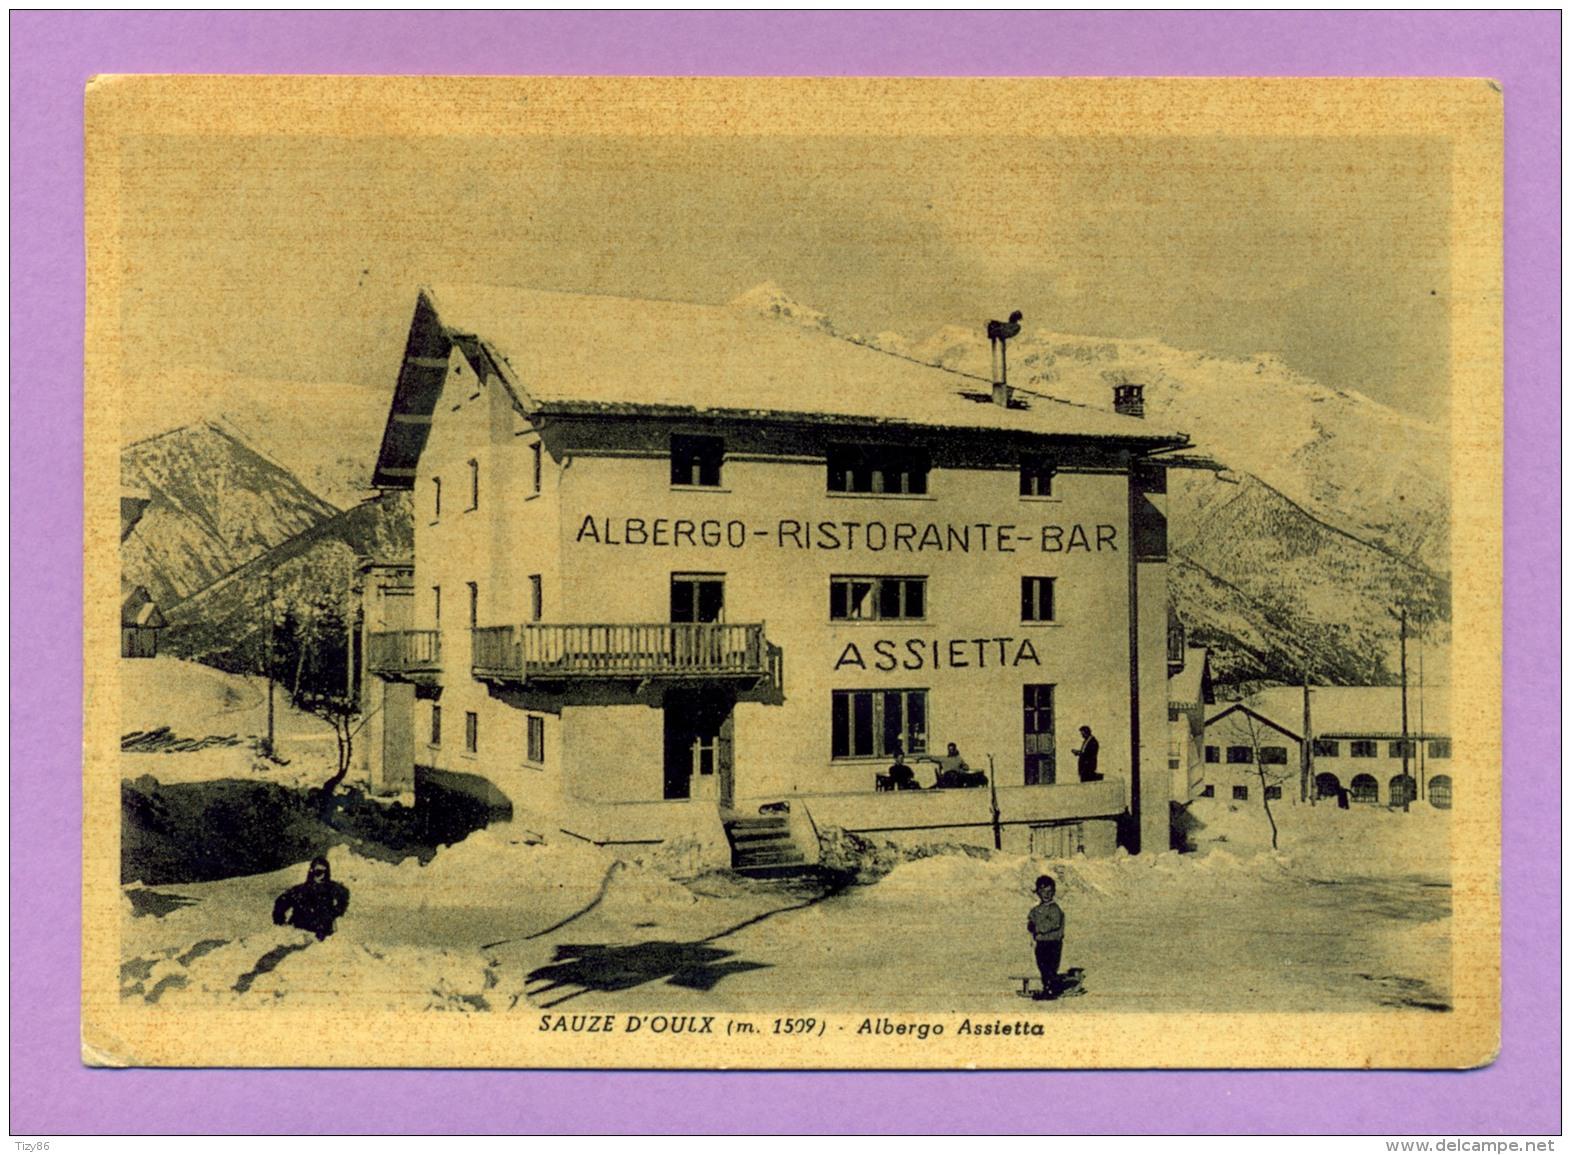 Sauze D'Oulx - Albergo Assietta - Italy